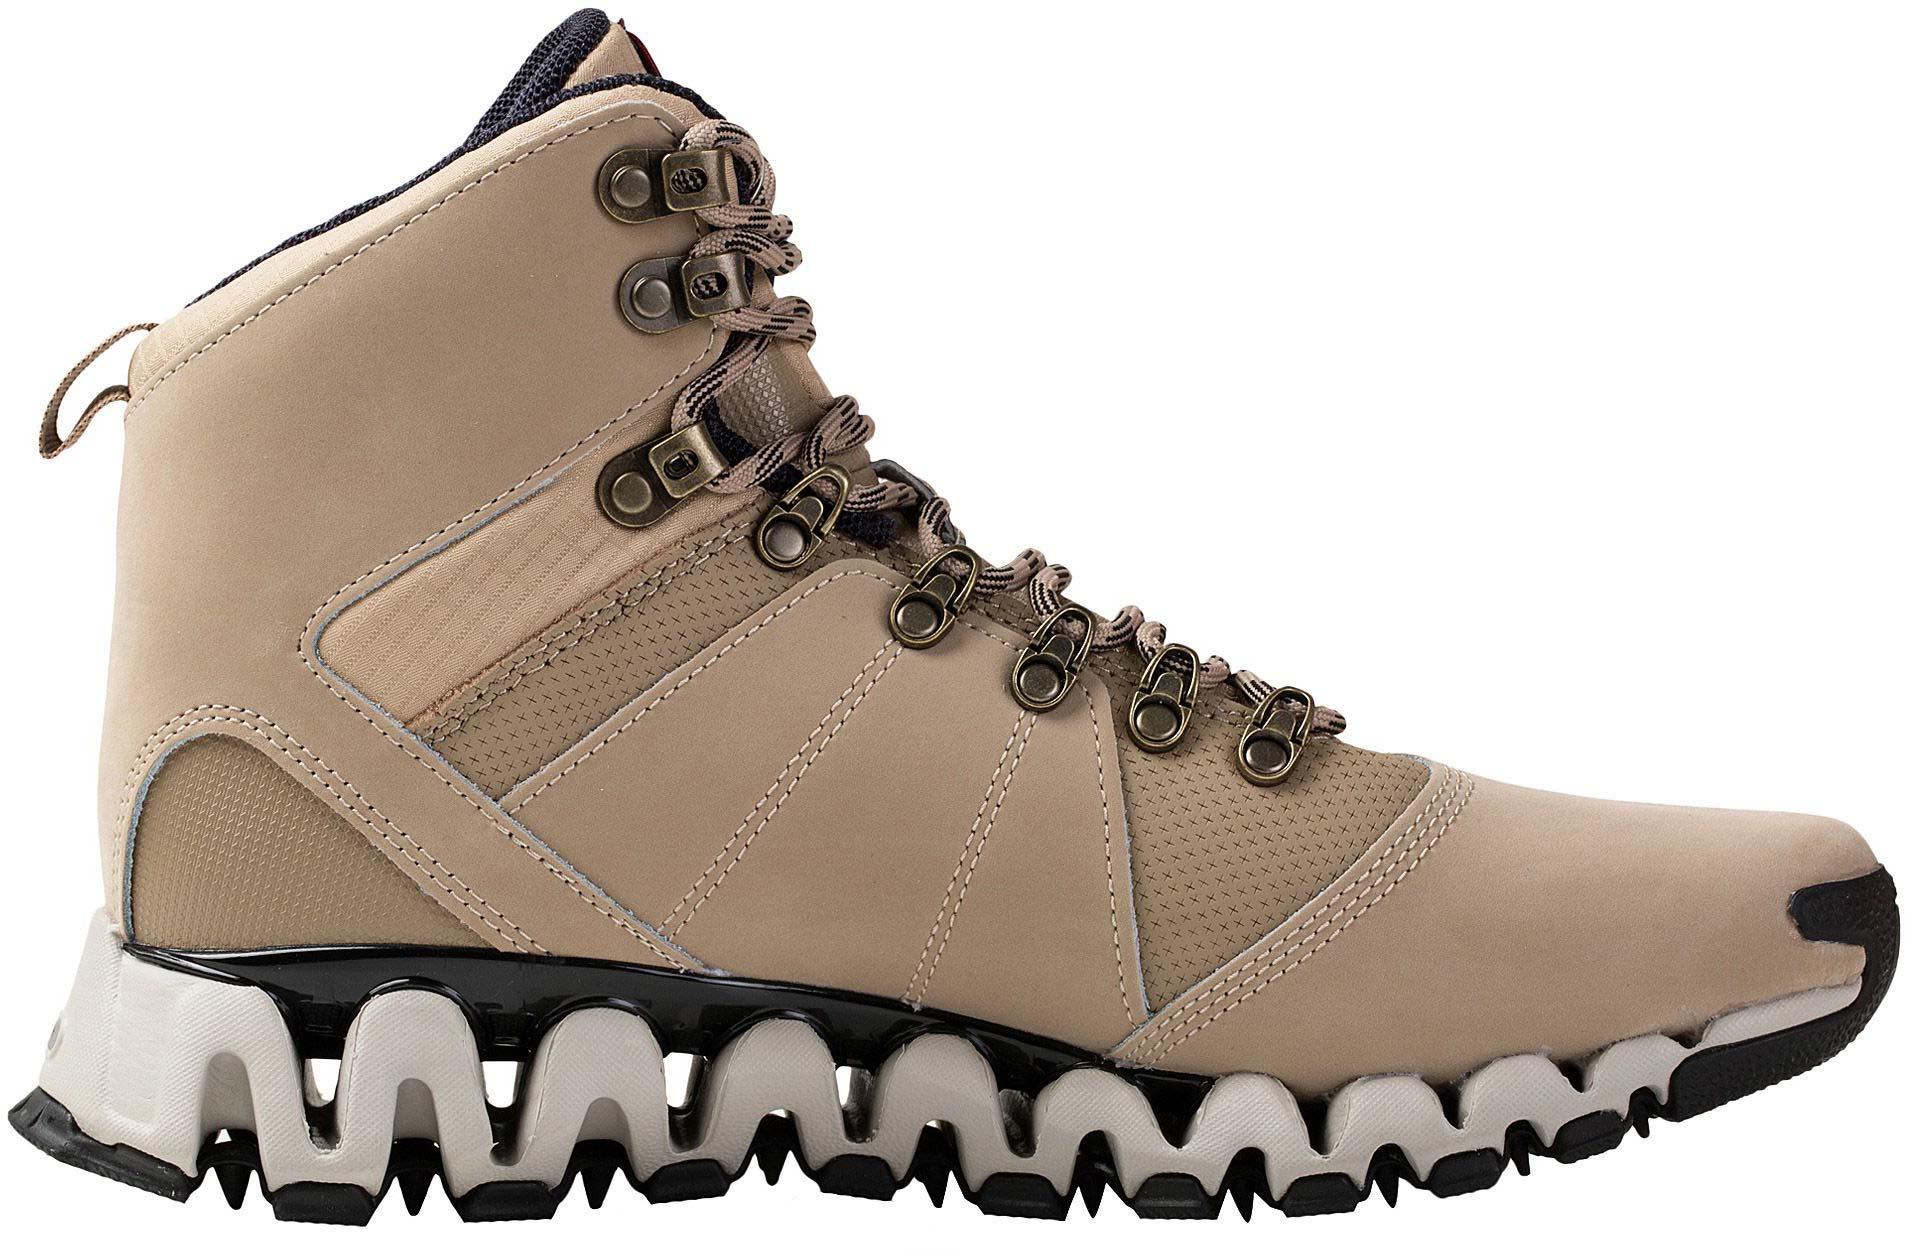 6479f03f2d0abf ZIGTRAIL MOBILIZE II MID - Men s trekking shoes